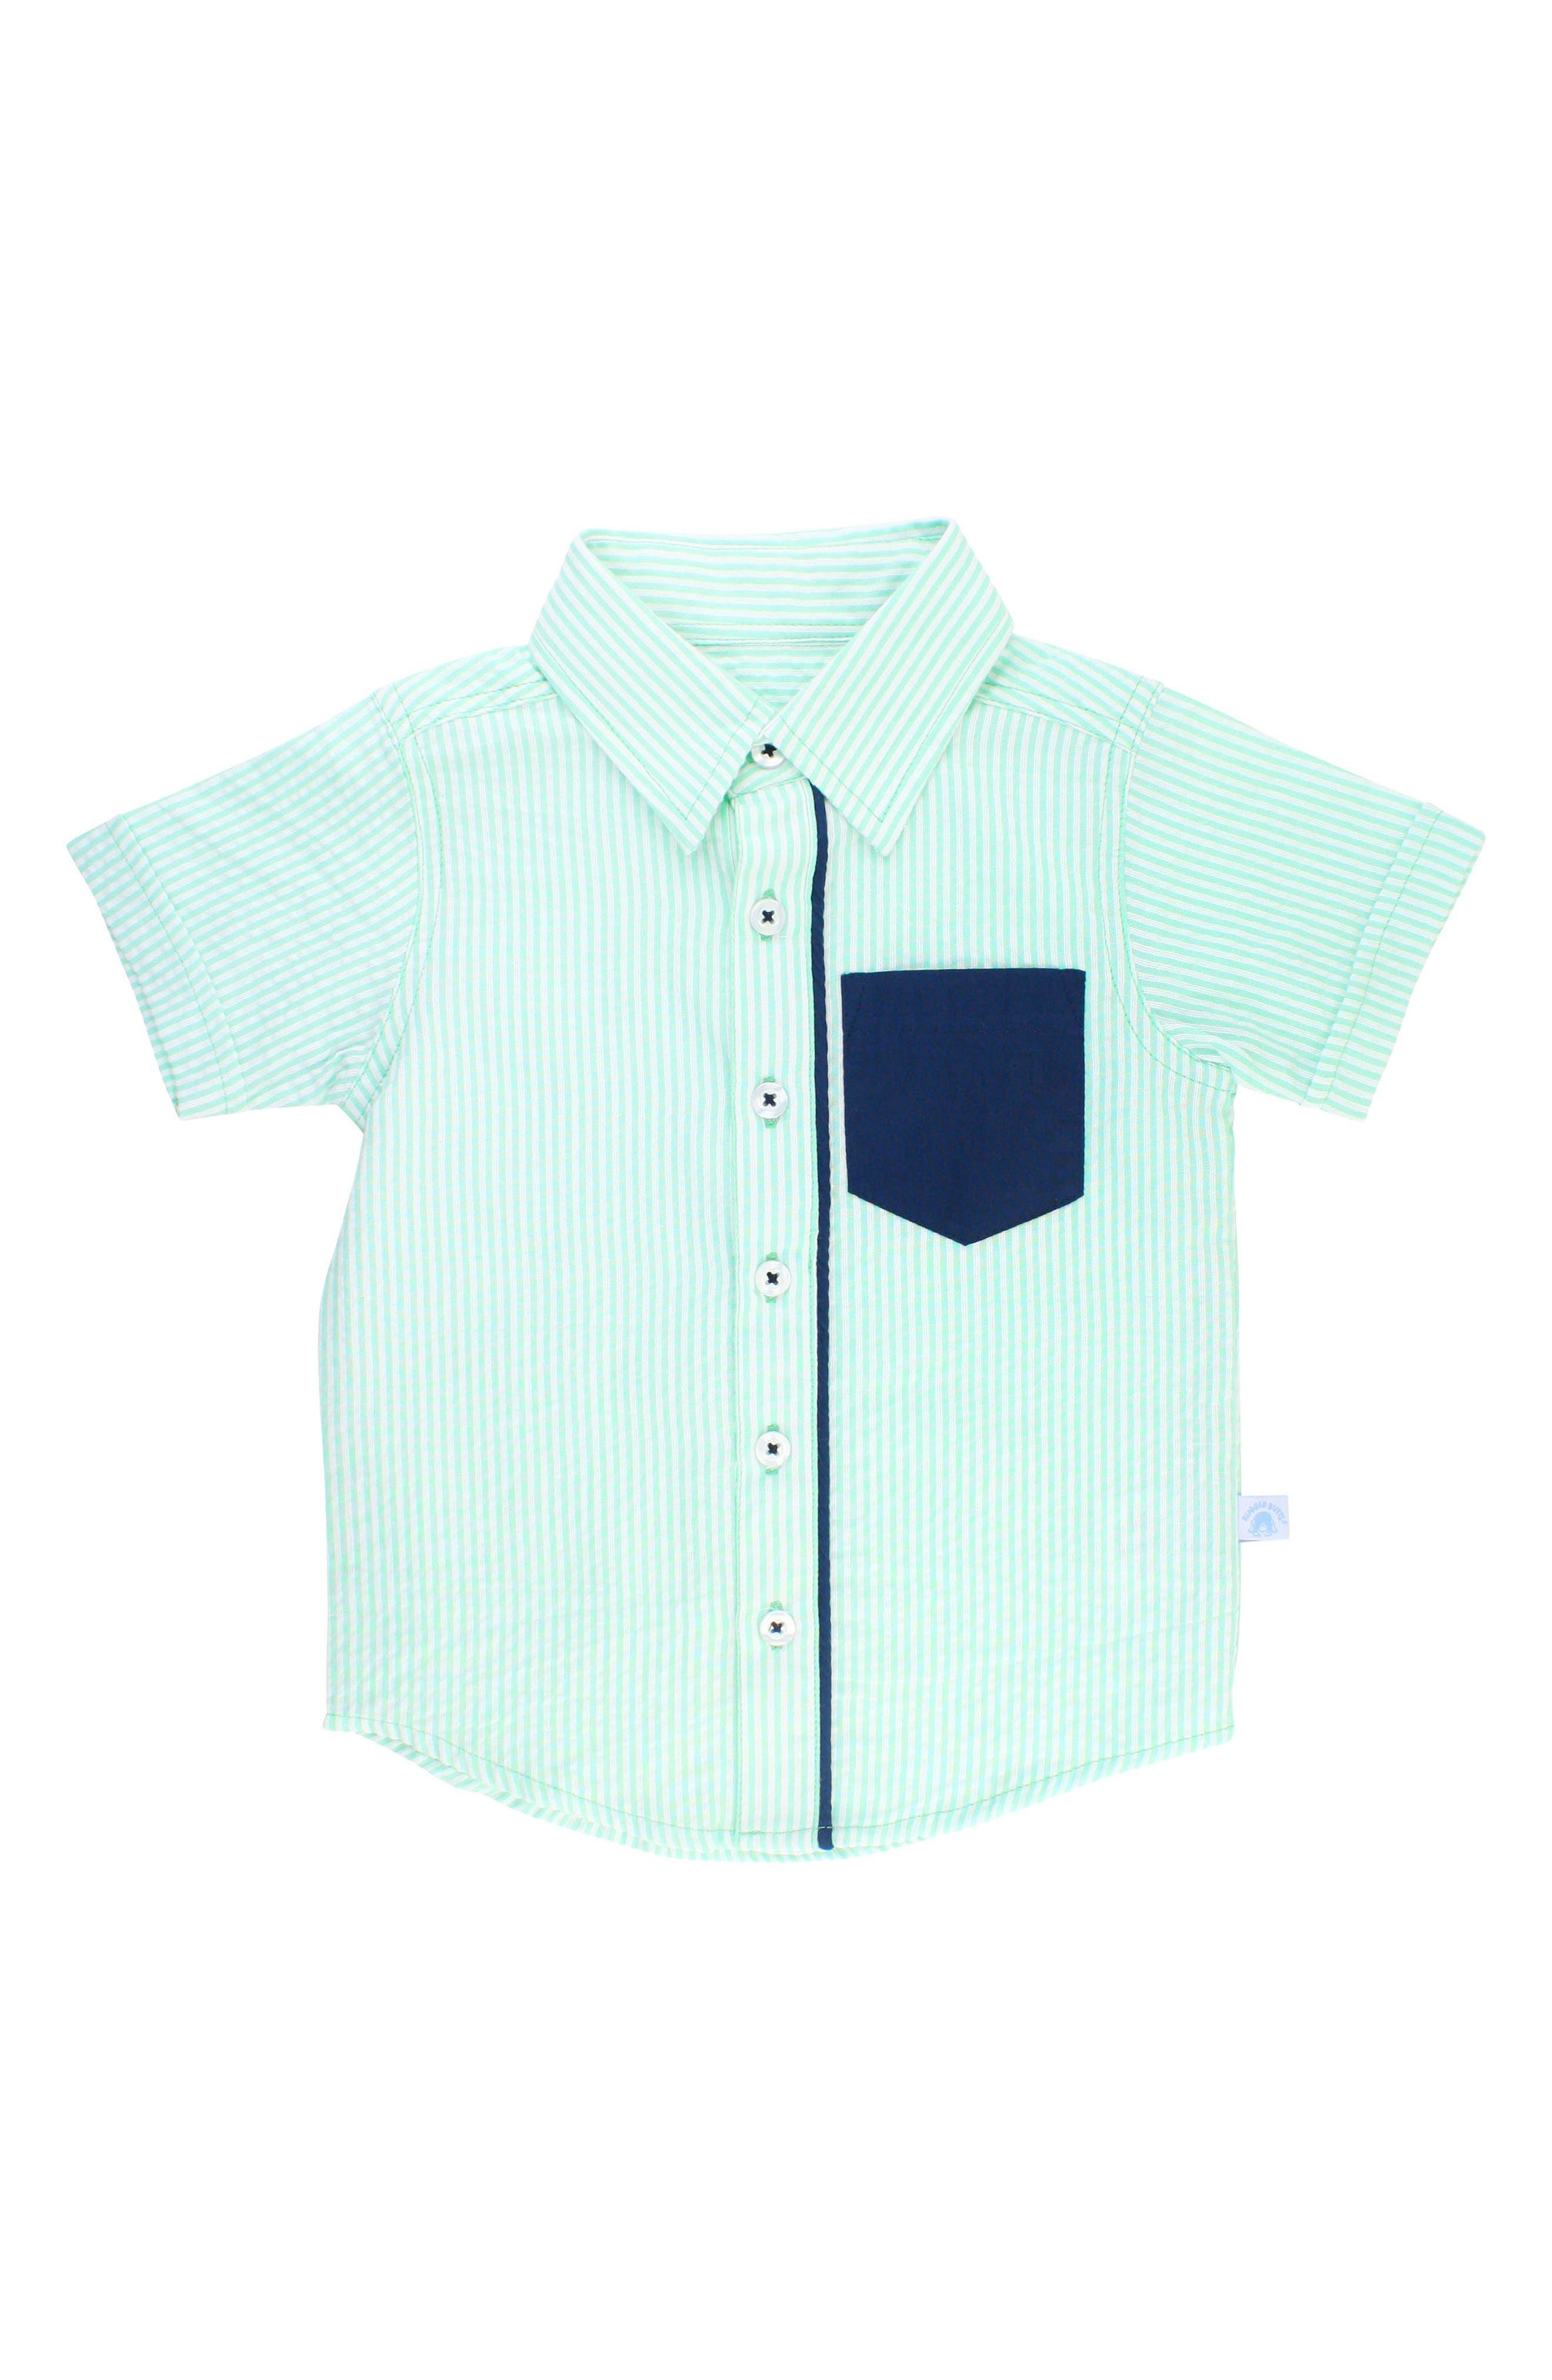 Seersucker Stripe Woven Shirt,                             Main thumbnail 1, color,                             300